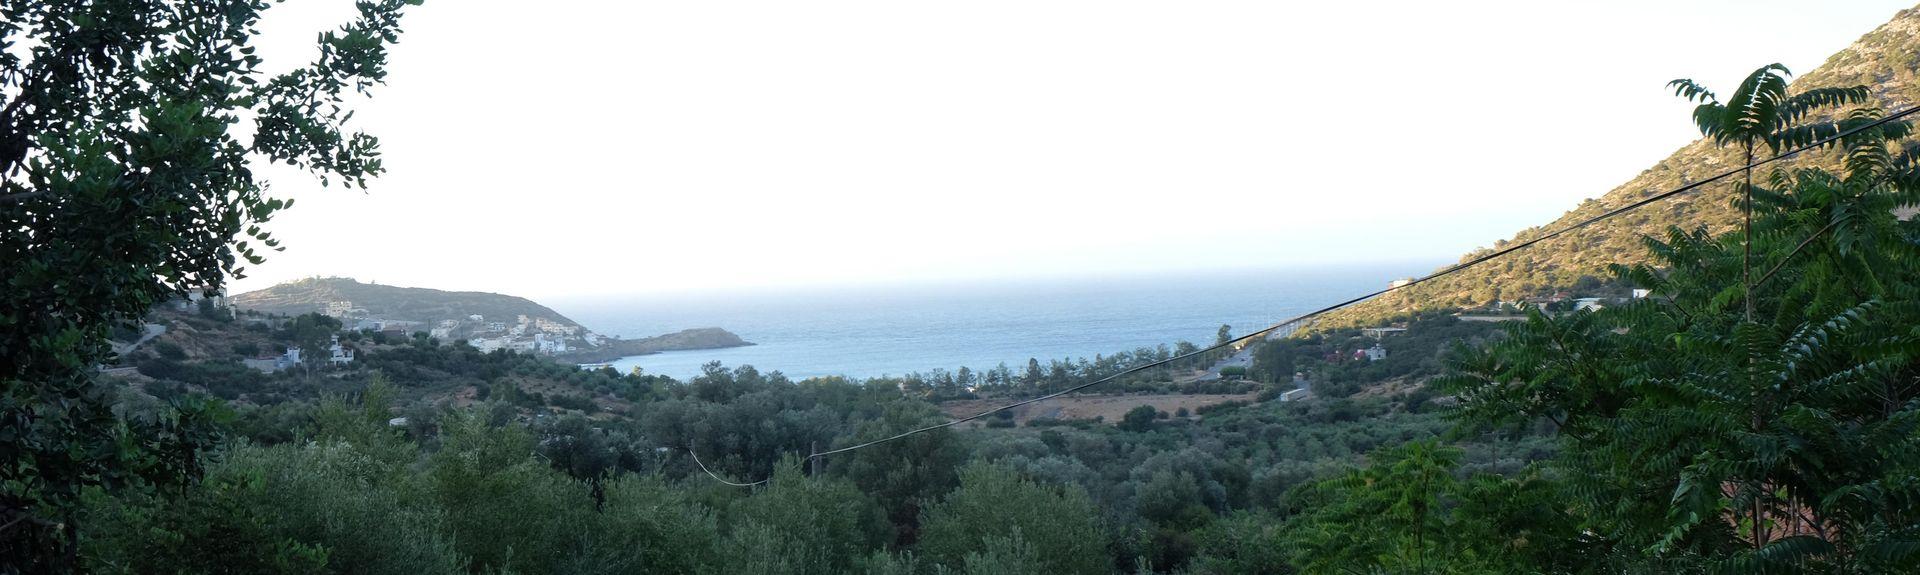 Vlichada, Kreetan saari, Kreikka